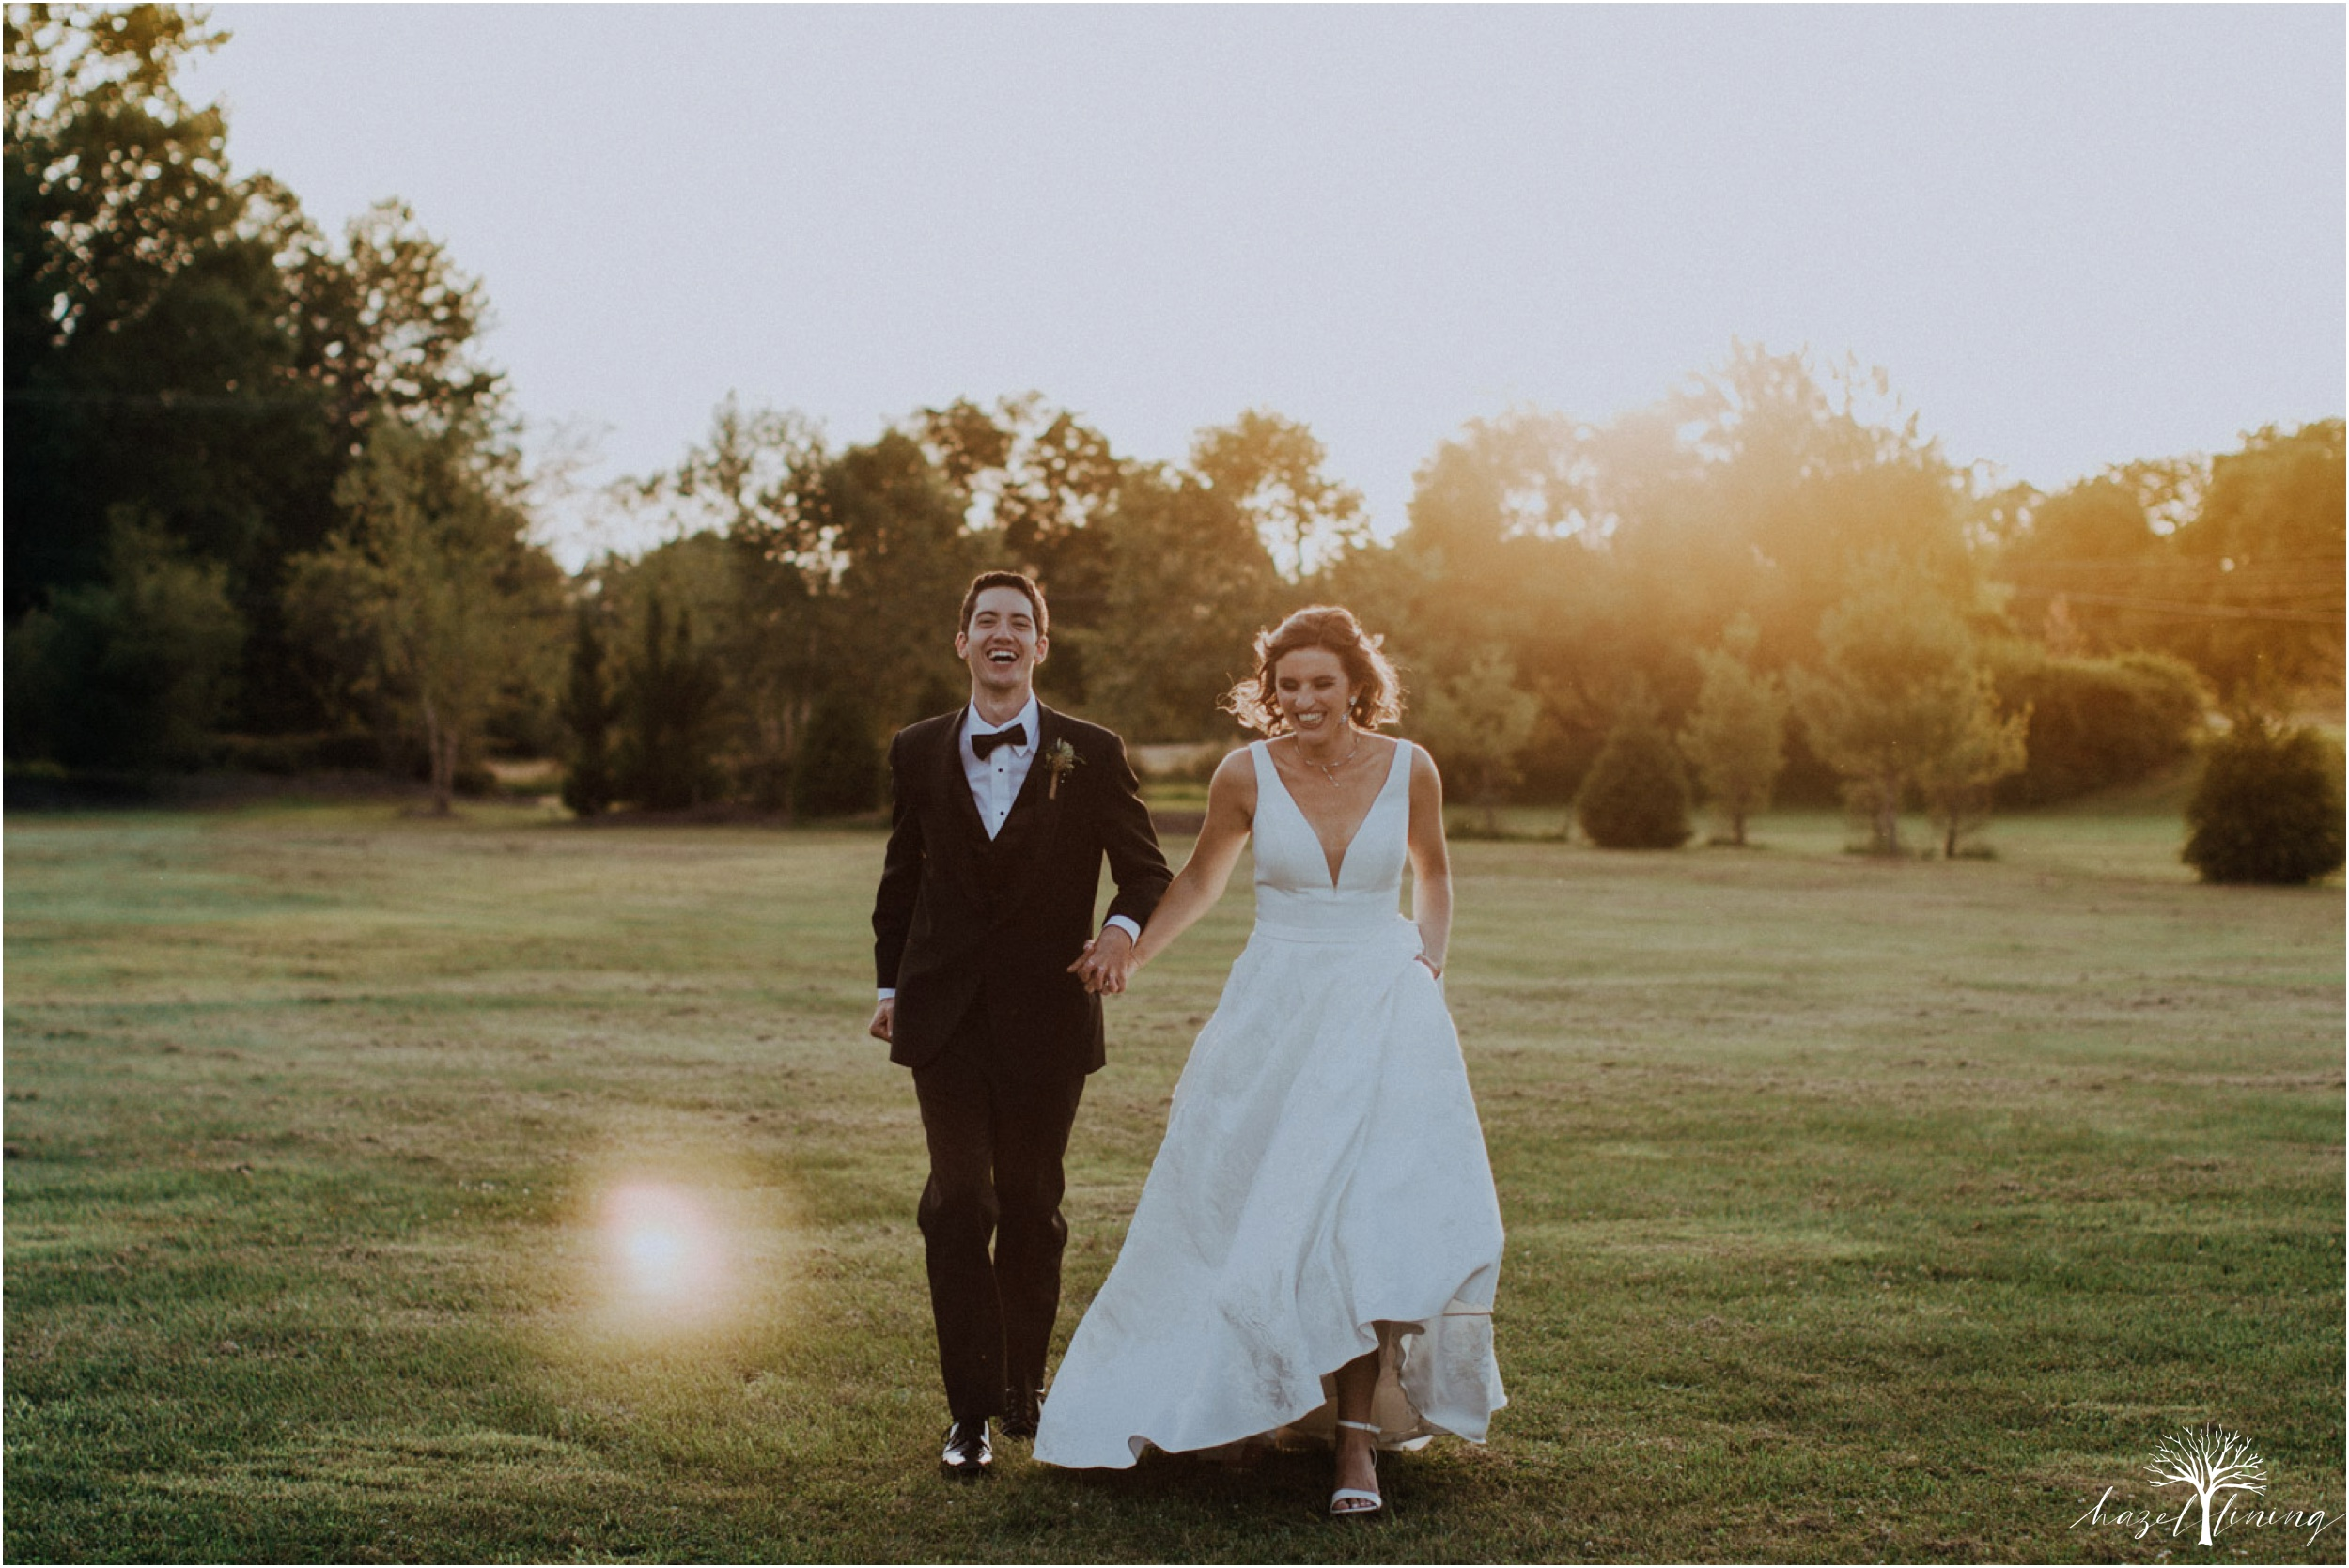 maureen-hepner-anthony-giordano-rose-bank-winery-newtow-pennsylvania-luxury-summer-wedding-hazel-lining-photography-destination-elopement-wedding-engagement-photography_0172.jpg